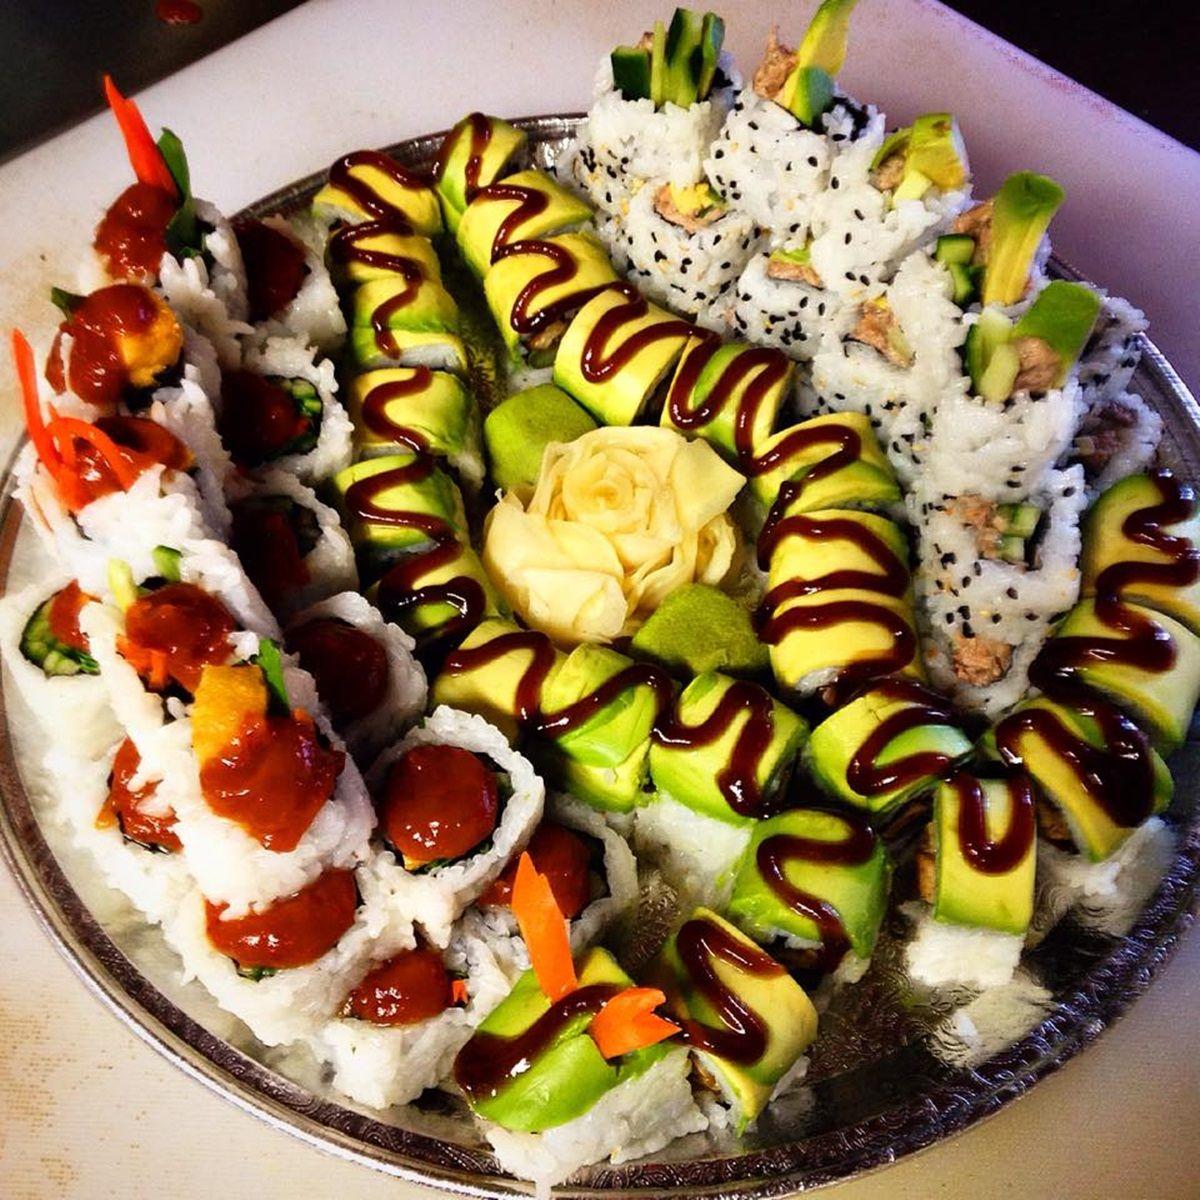 10 Restaurants In America Offering The Most Epic Vegan Sushi Rolls